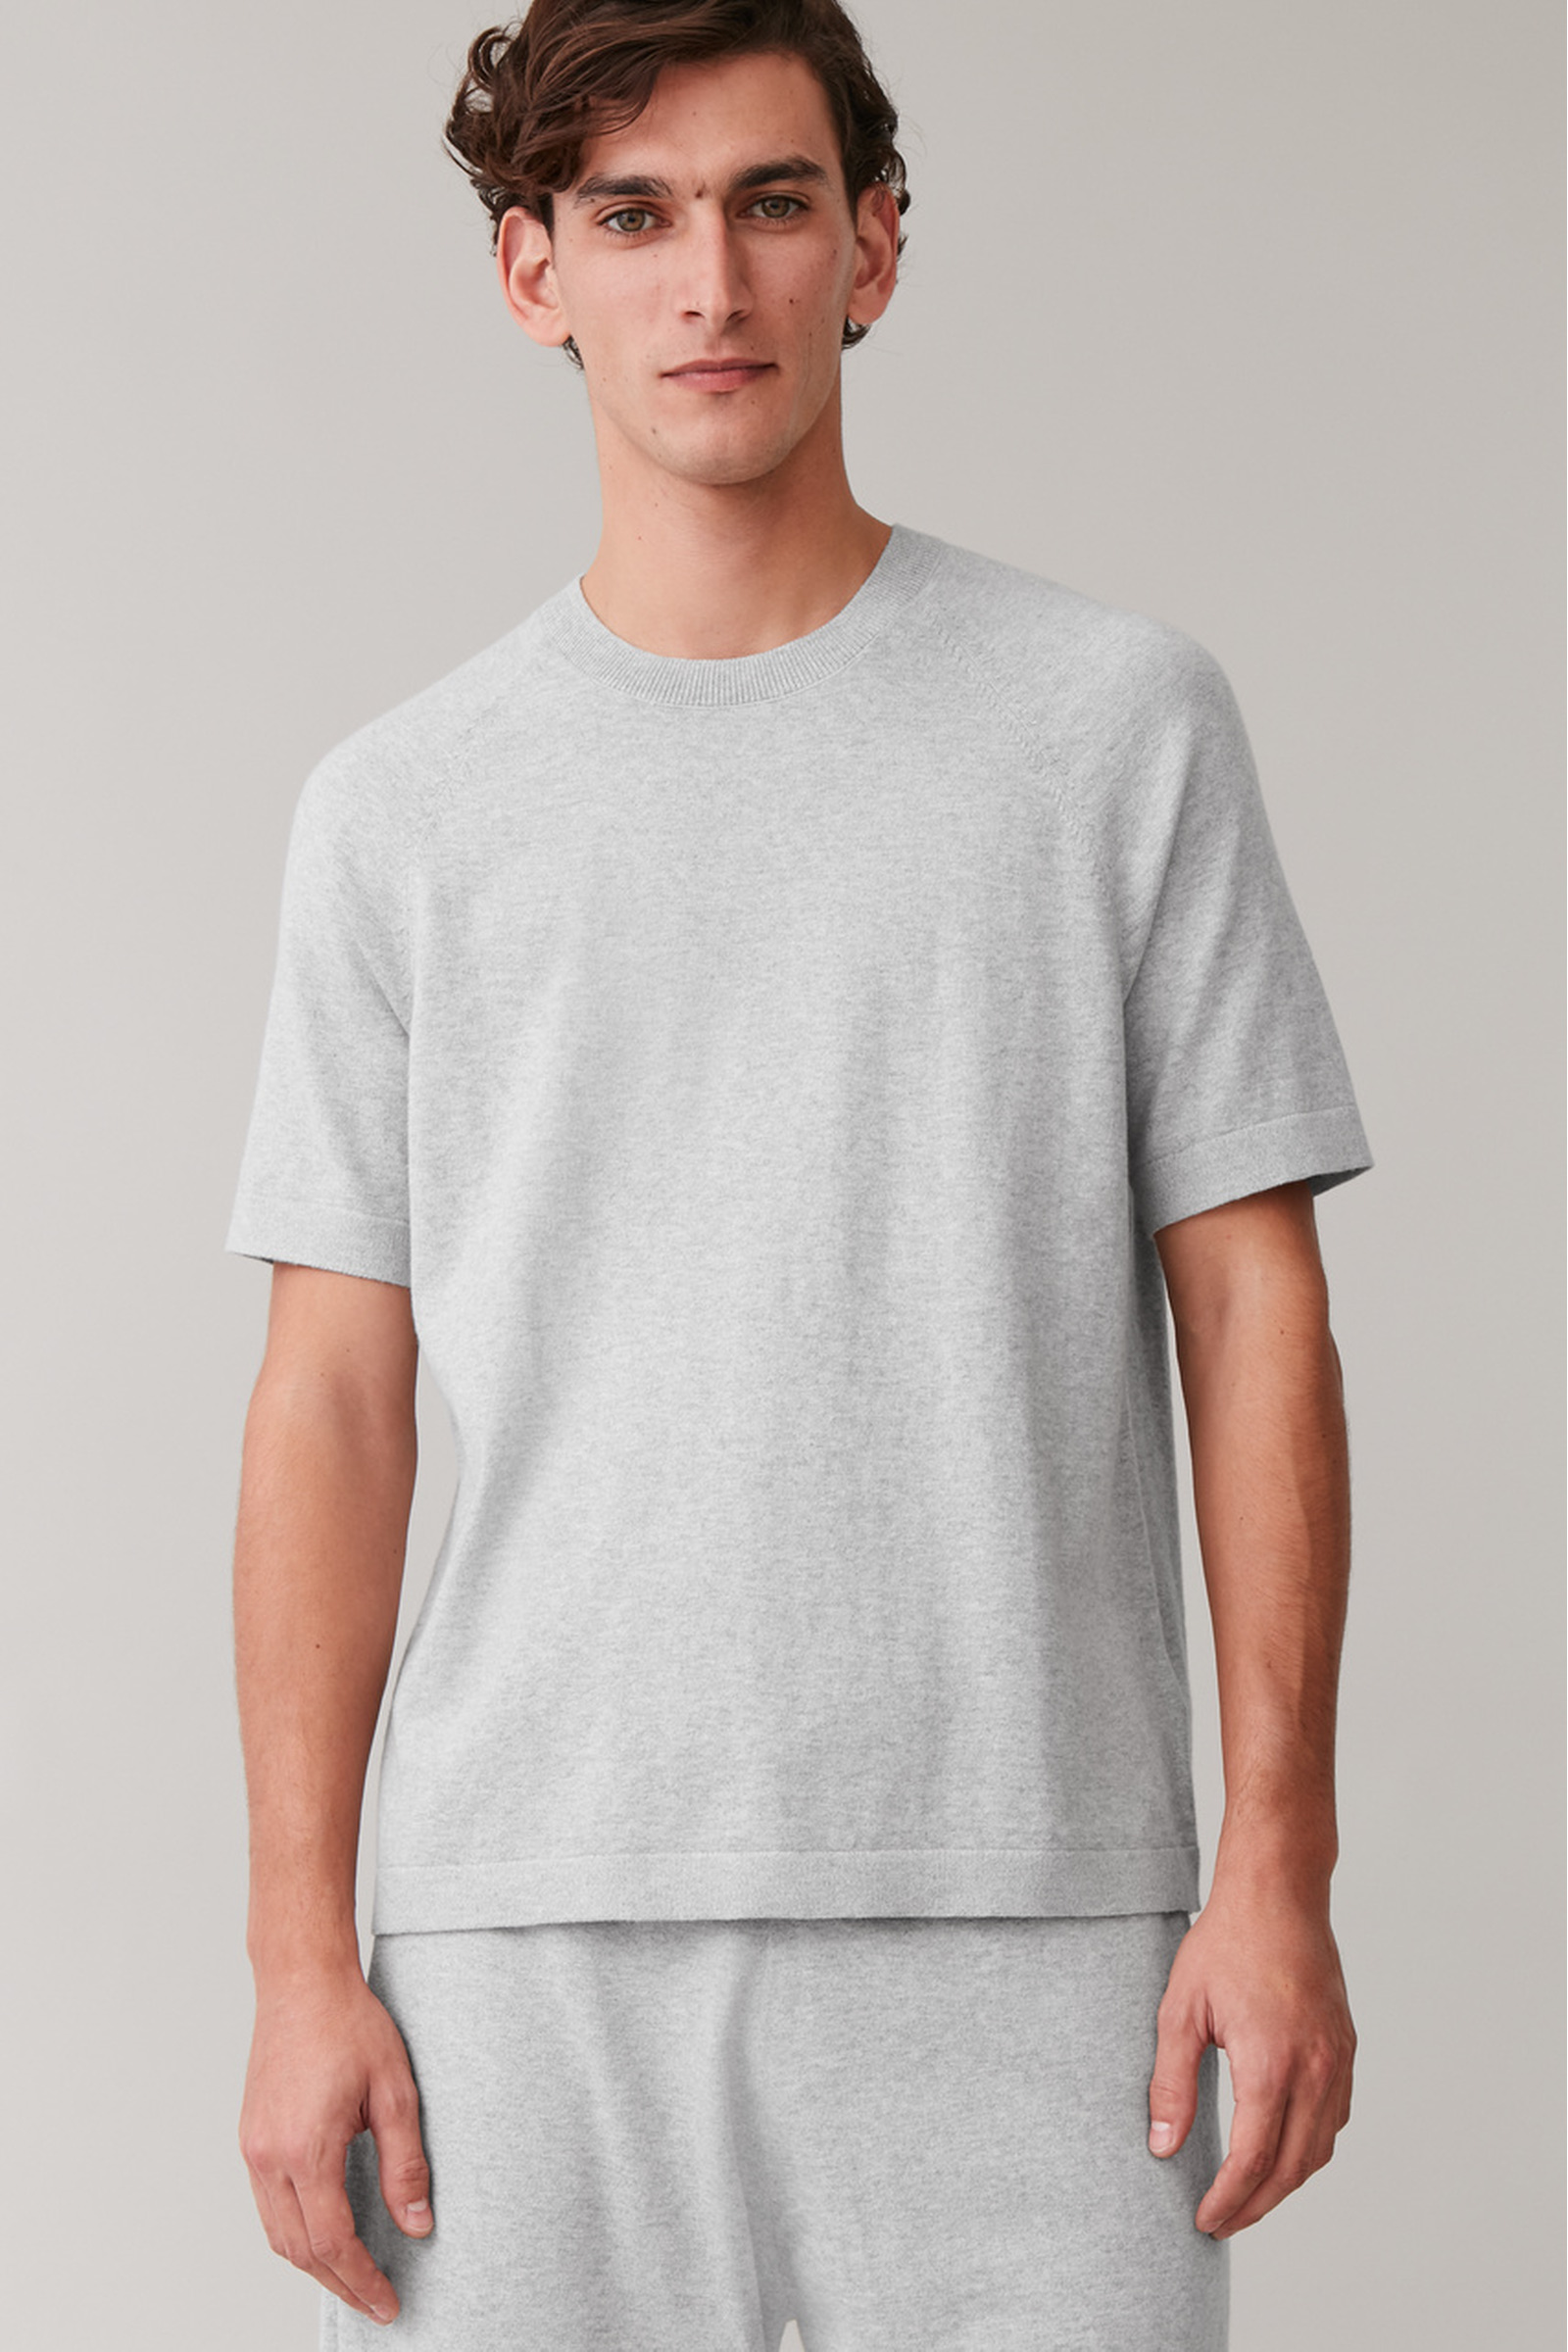 COS 코튼 캐시미어 니티드 티셔츠의 그레이컬러 ECOMLook입니다.